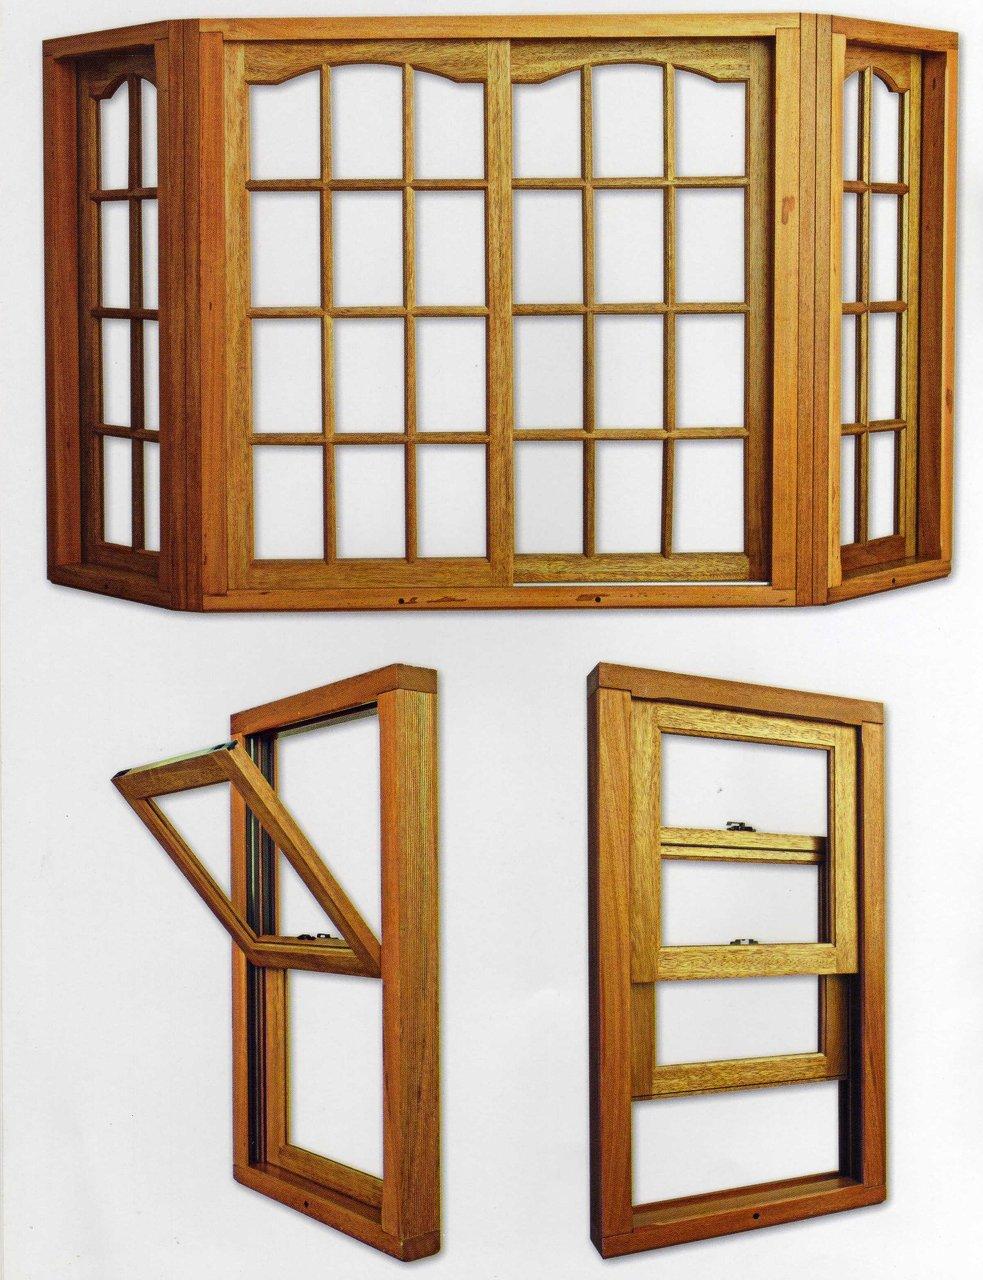 guillotinas y bow windows